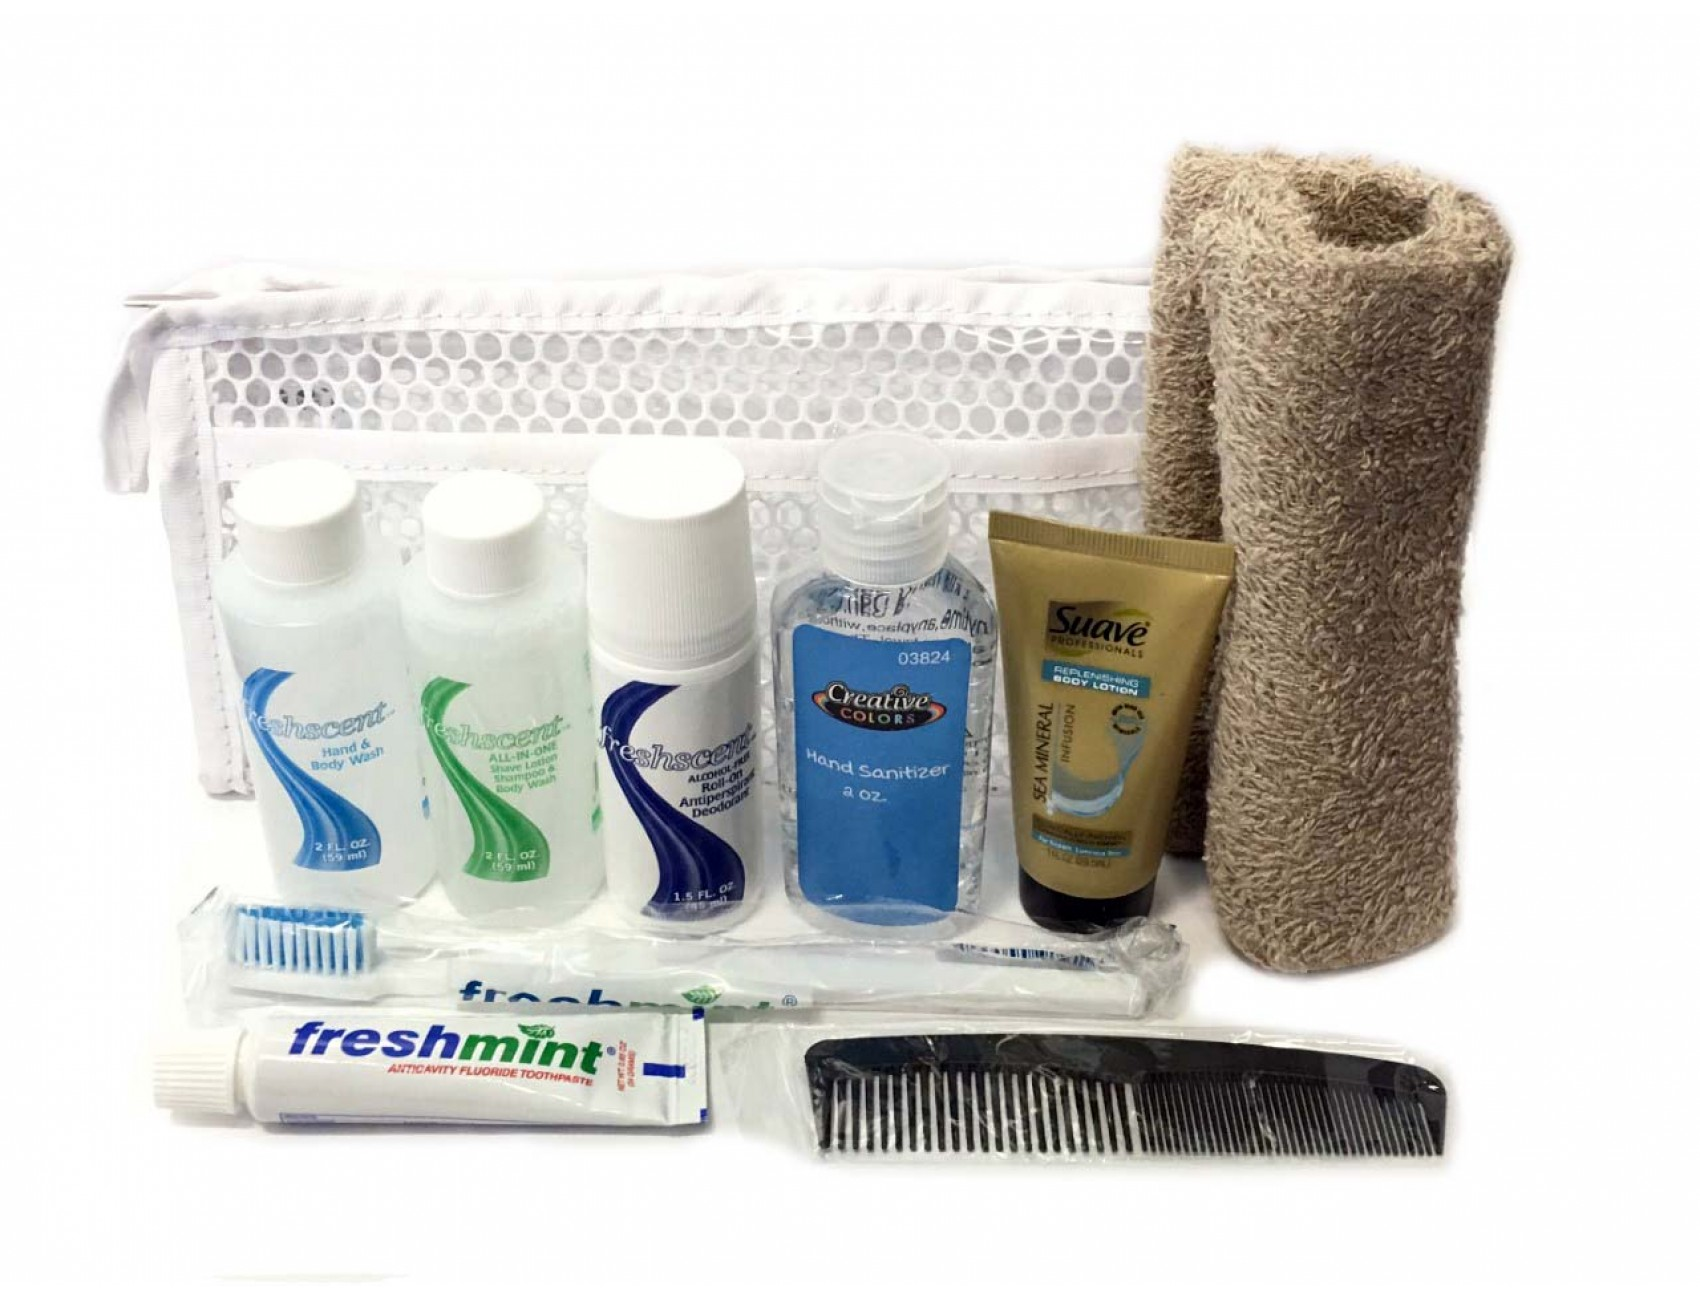 Wholesale hygiene Kit for traveling or hospital needs